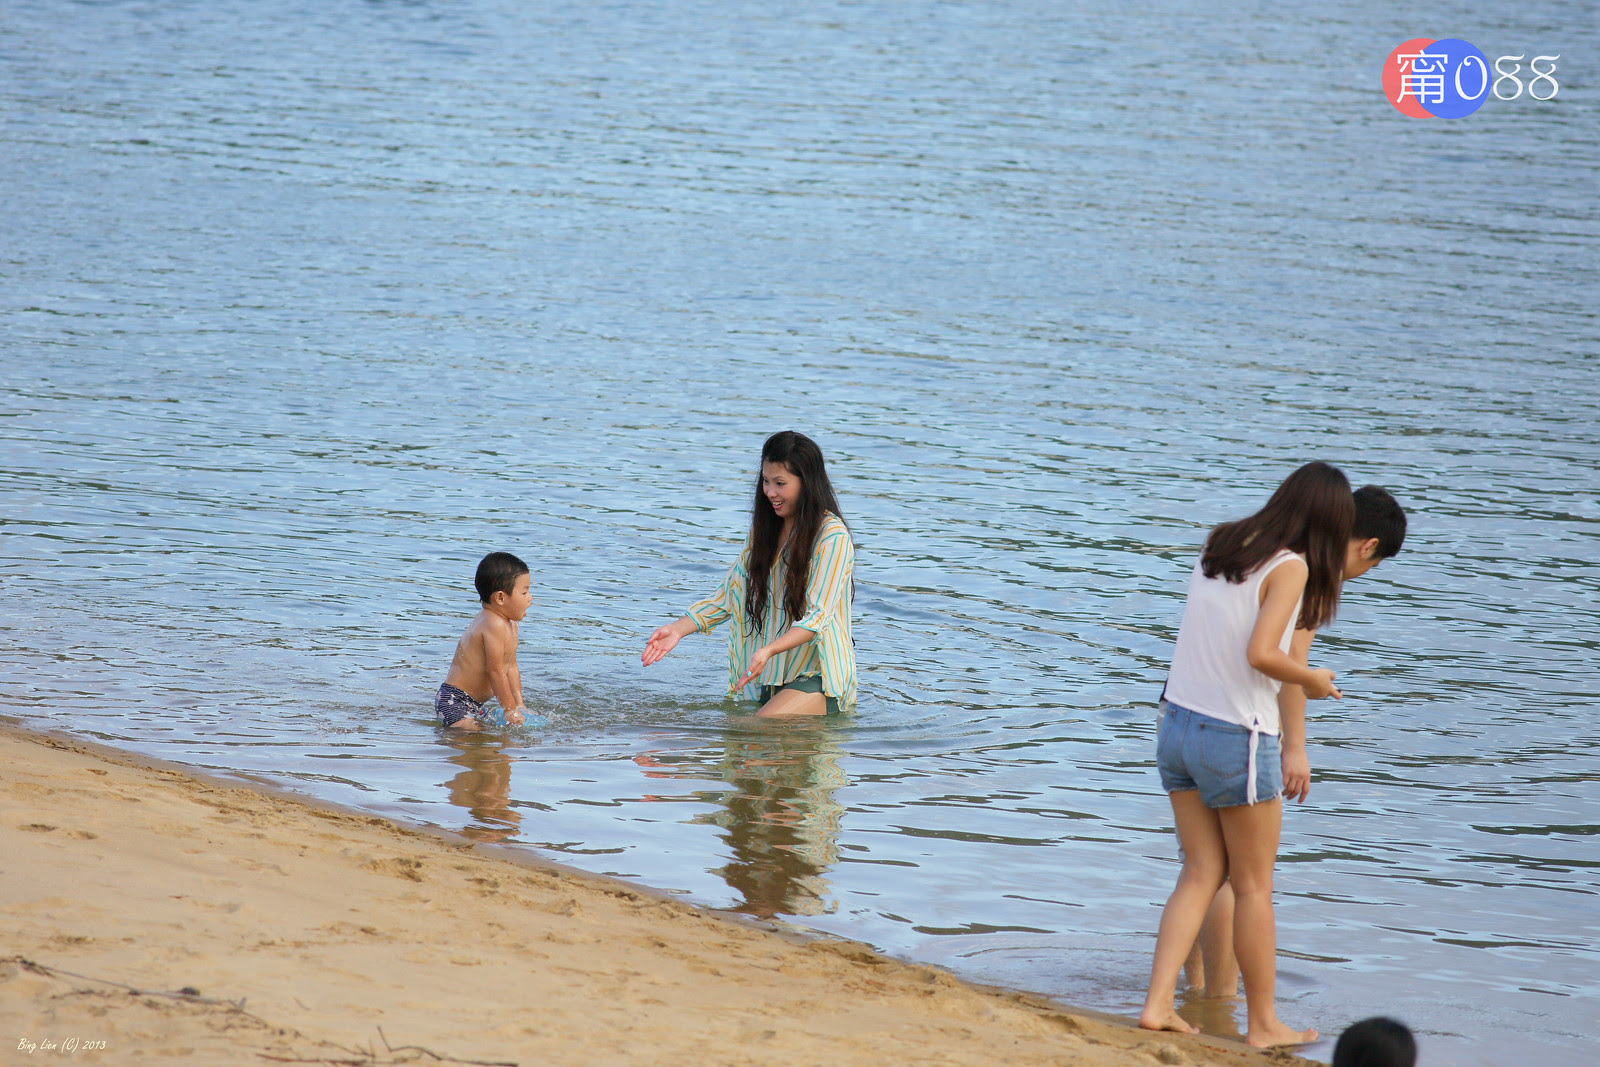 WATER_BING1336